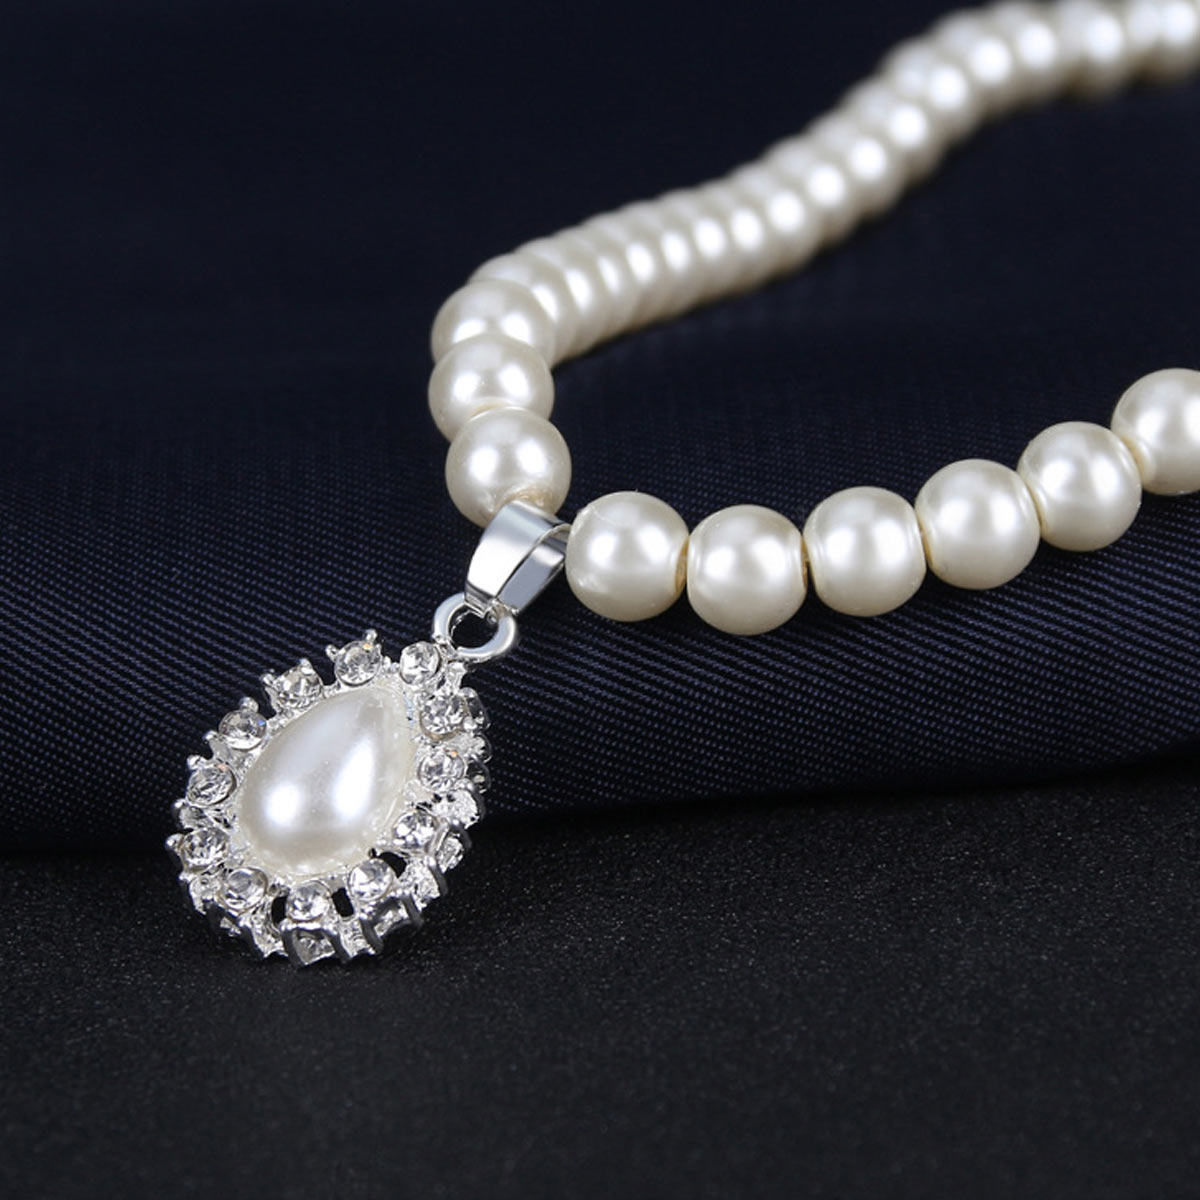 Pearl Rhinestone Cream Water Drop Shape Earring Set